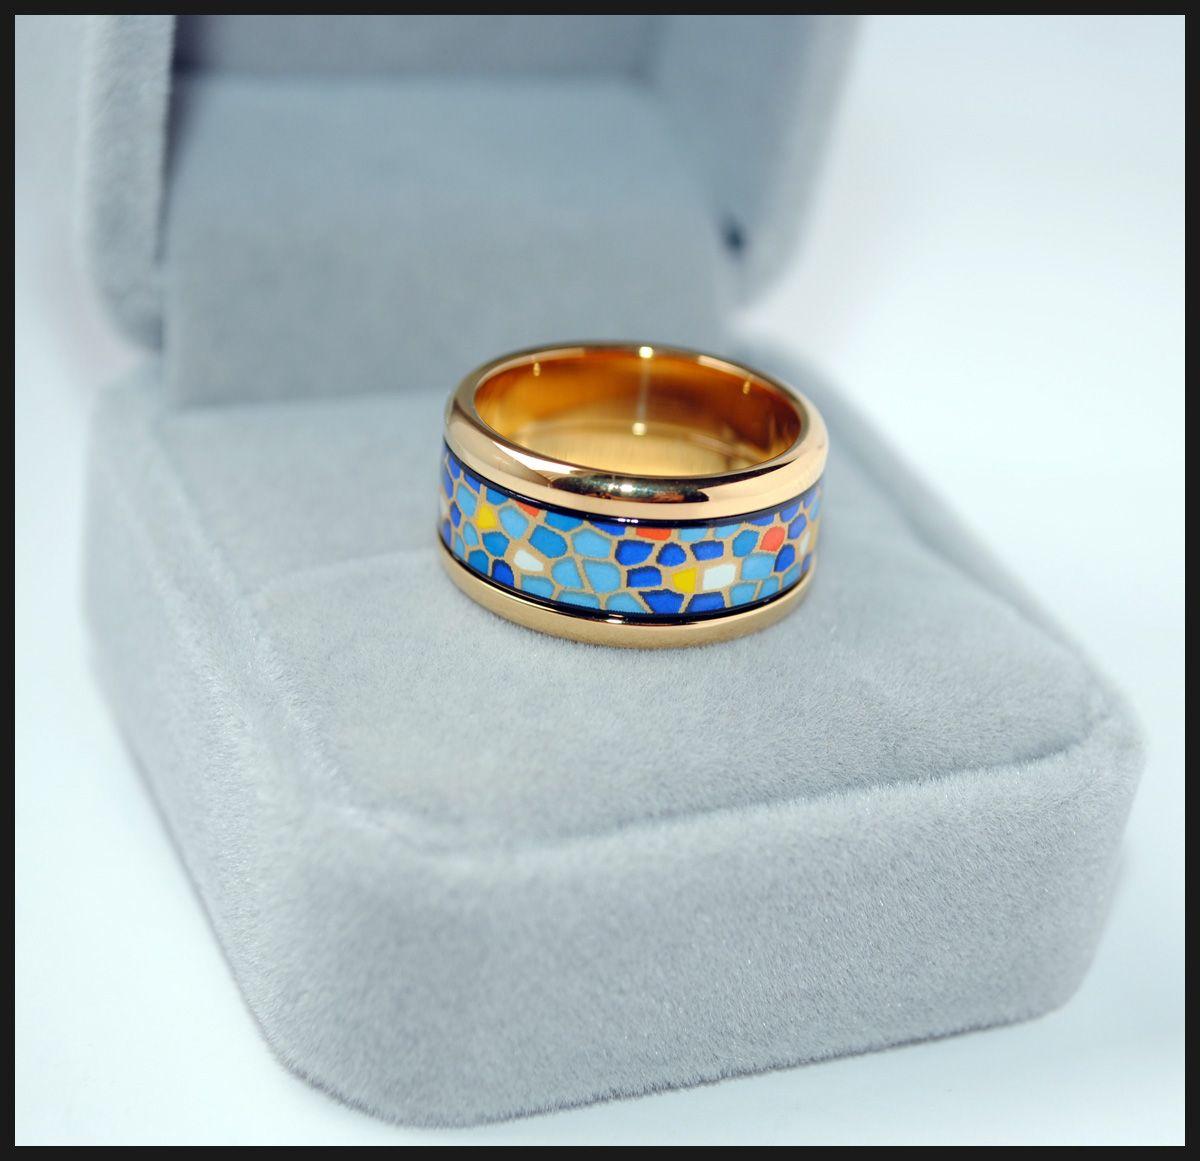 Pieces Series rings 18K anillos de esmalte dorado Anillo de calidad superior para mujer anillos de banda para regalo